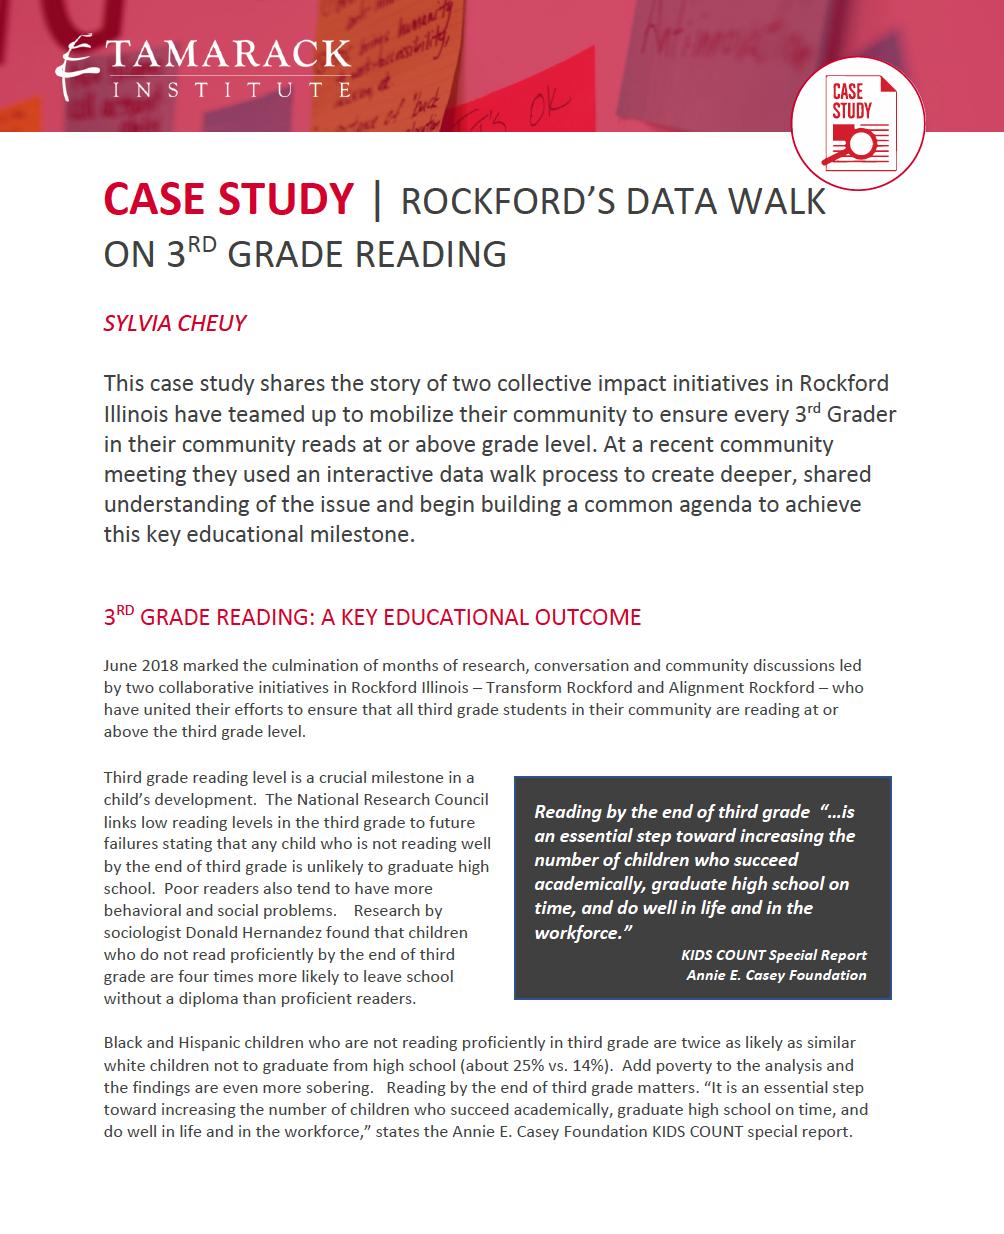 2018 Case Study Rockford Data Walk.png